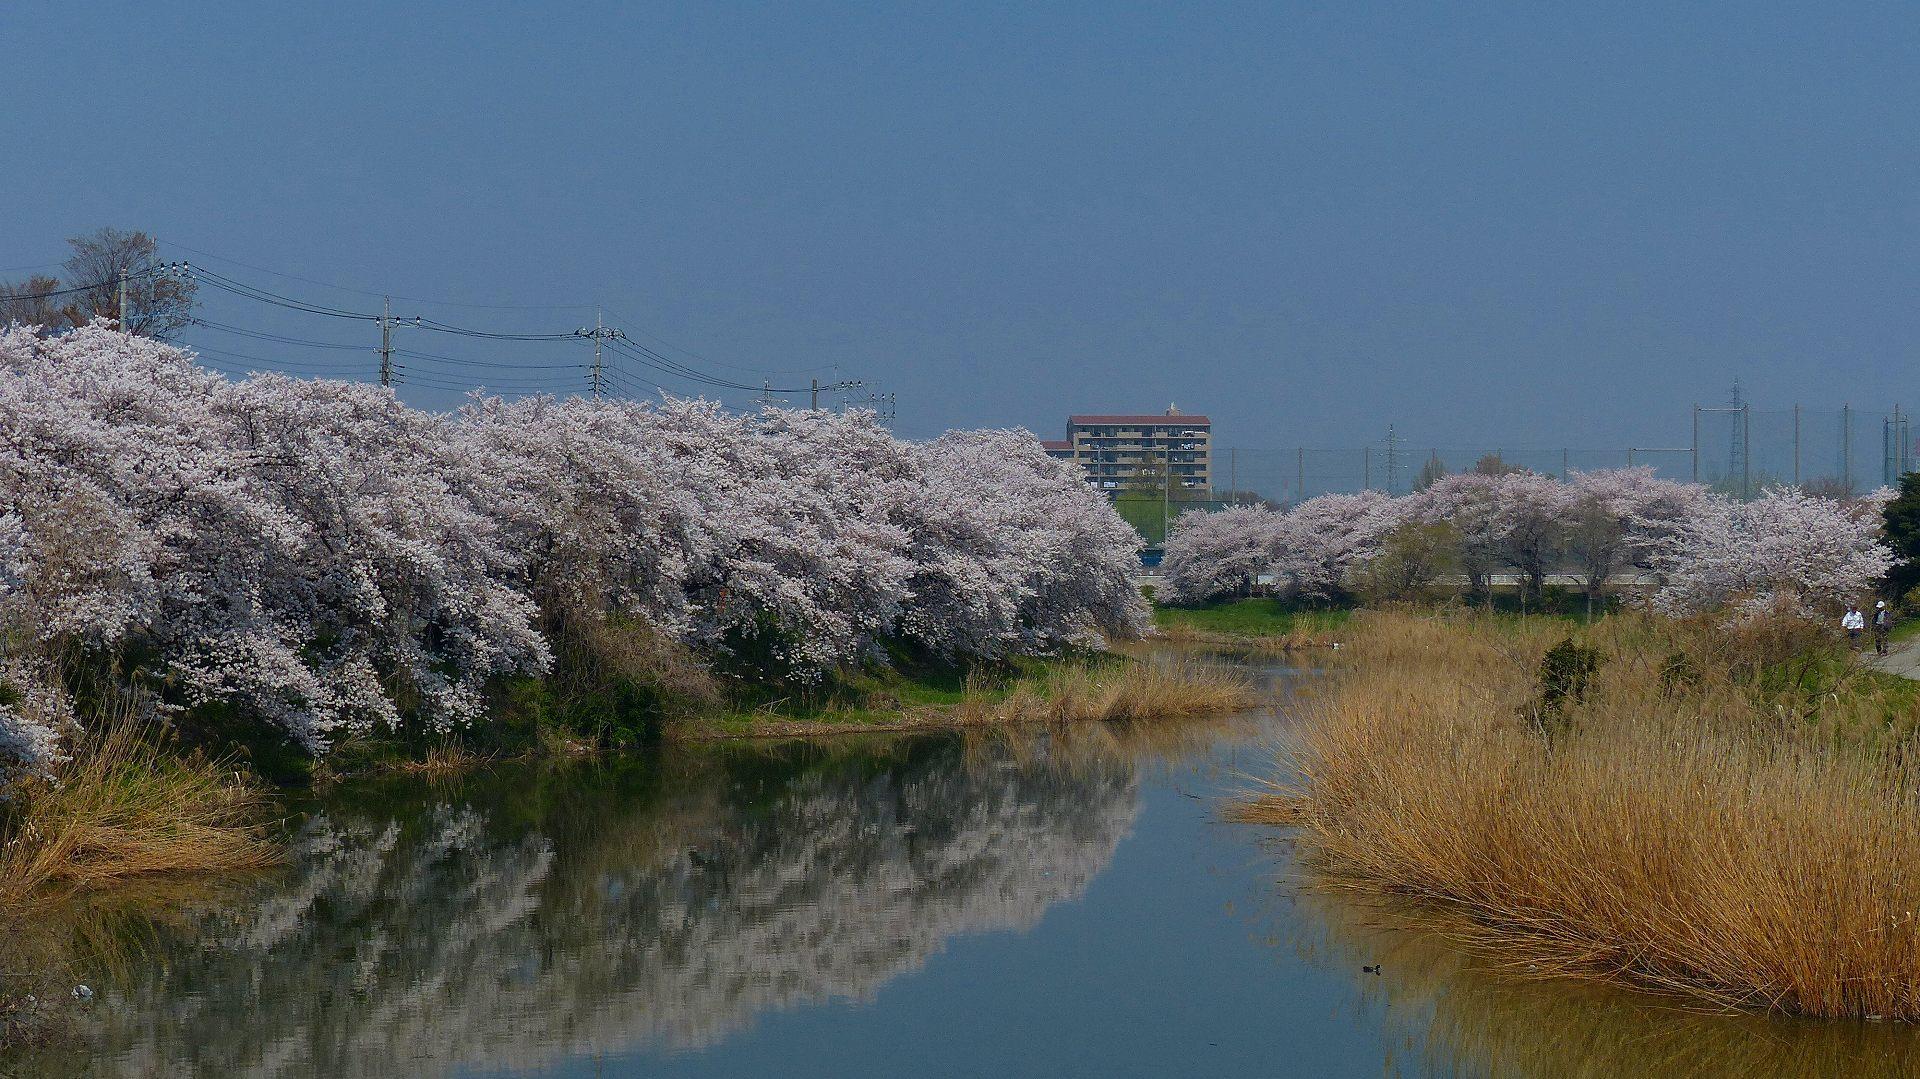 満開の桜を堪能! 【 2018 3/28(水) 】_a0185081_19285546.jpg